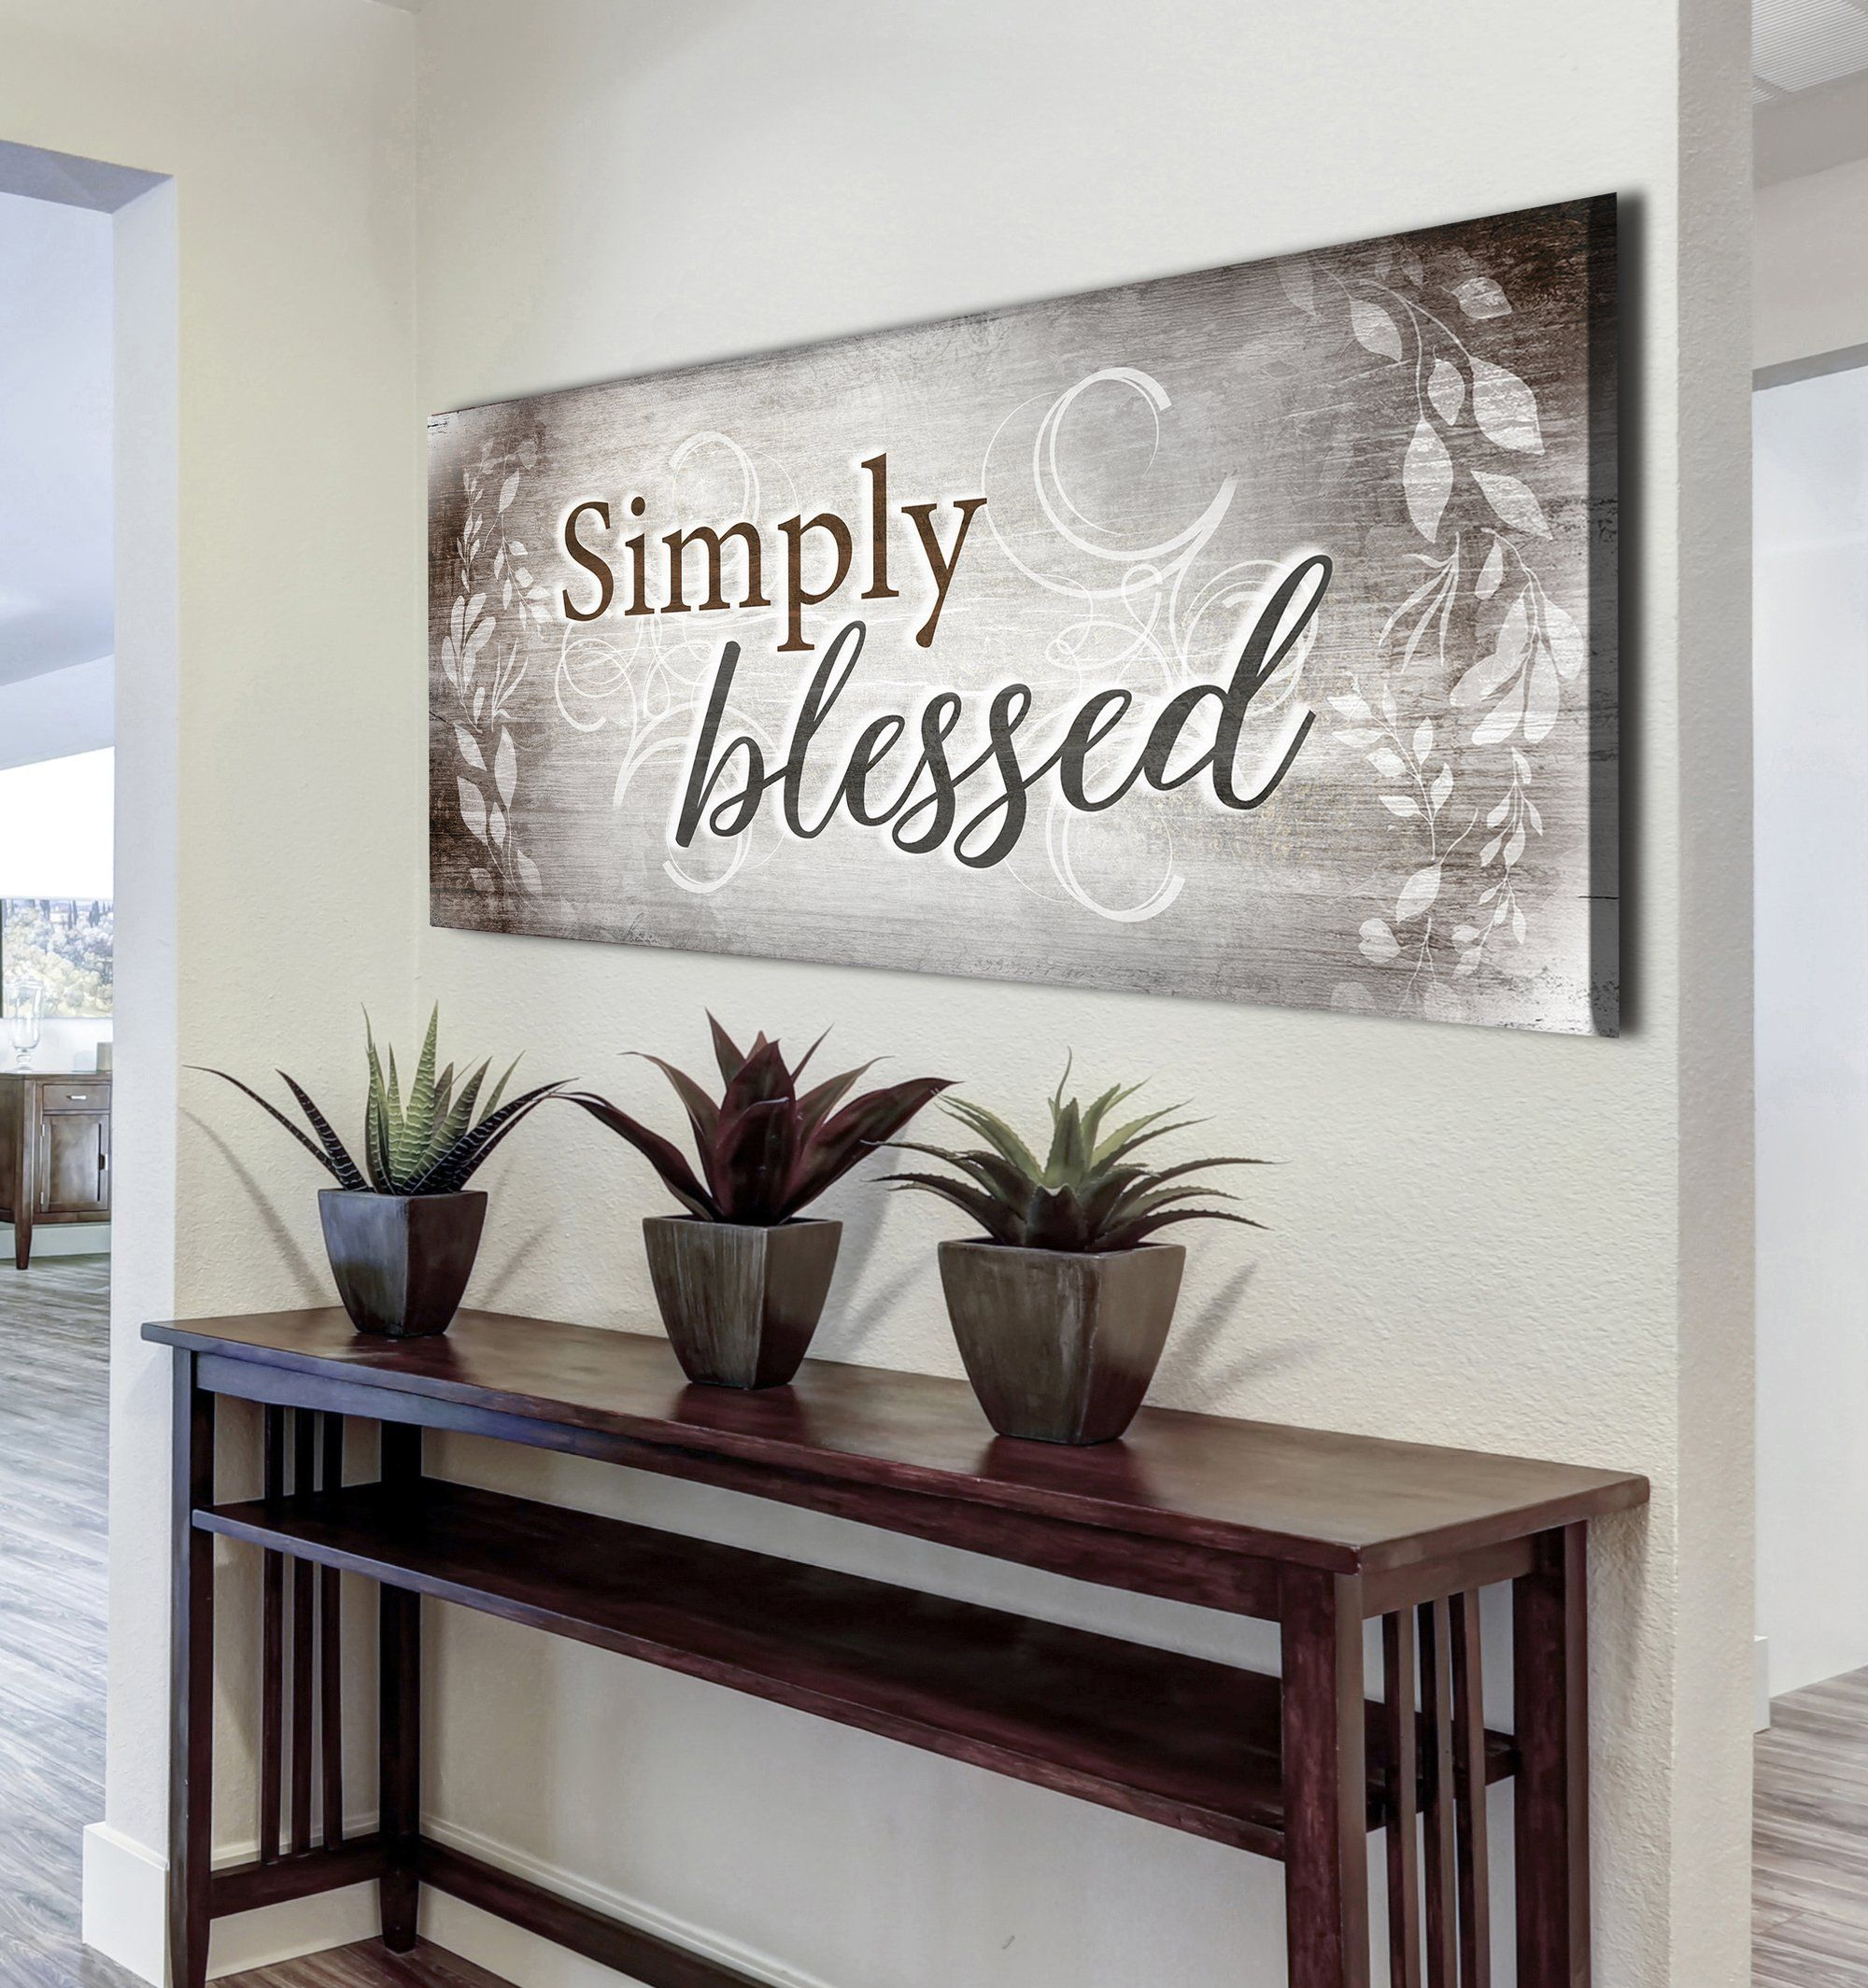 Christian Wall Art Simply Blessed V4 Wood Frame Ready To Hang Sense Of Art Christian Wall Art Home Wall Art Family Wall Art